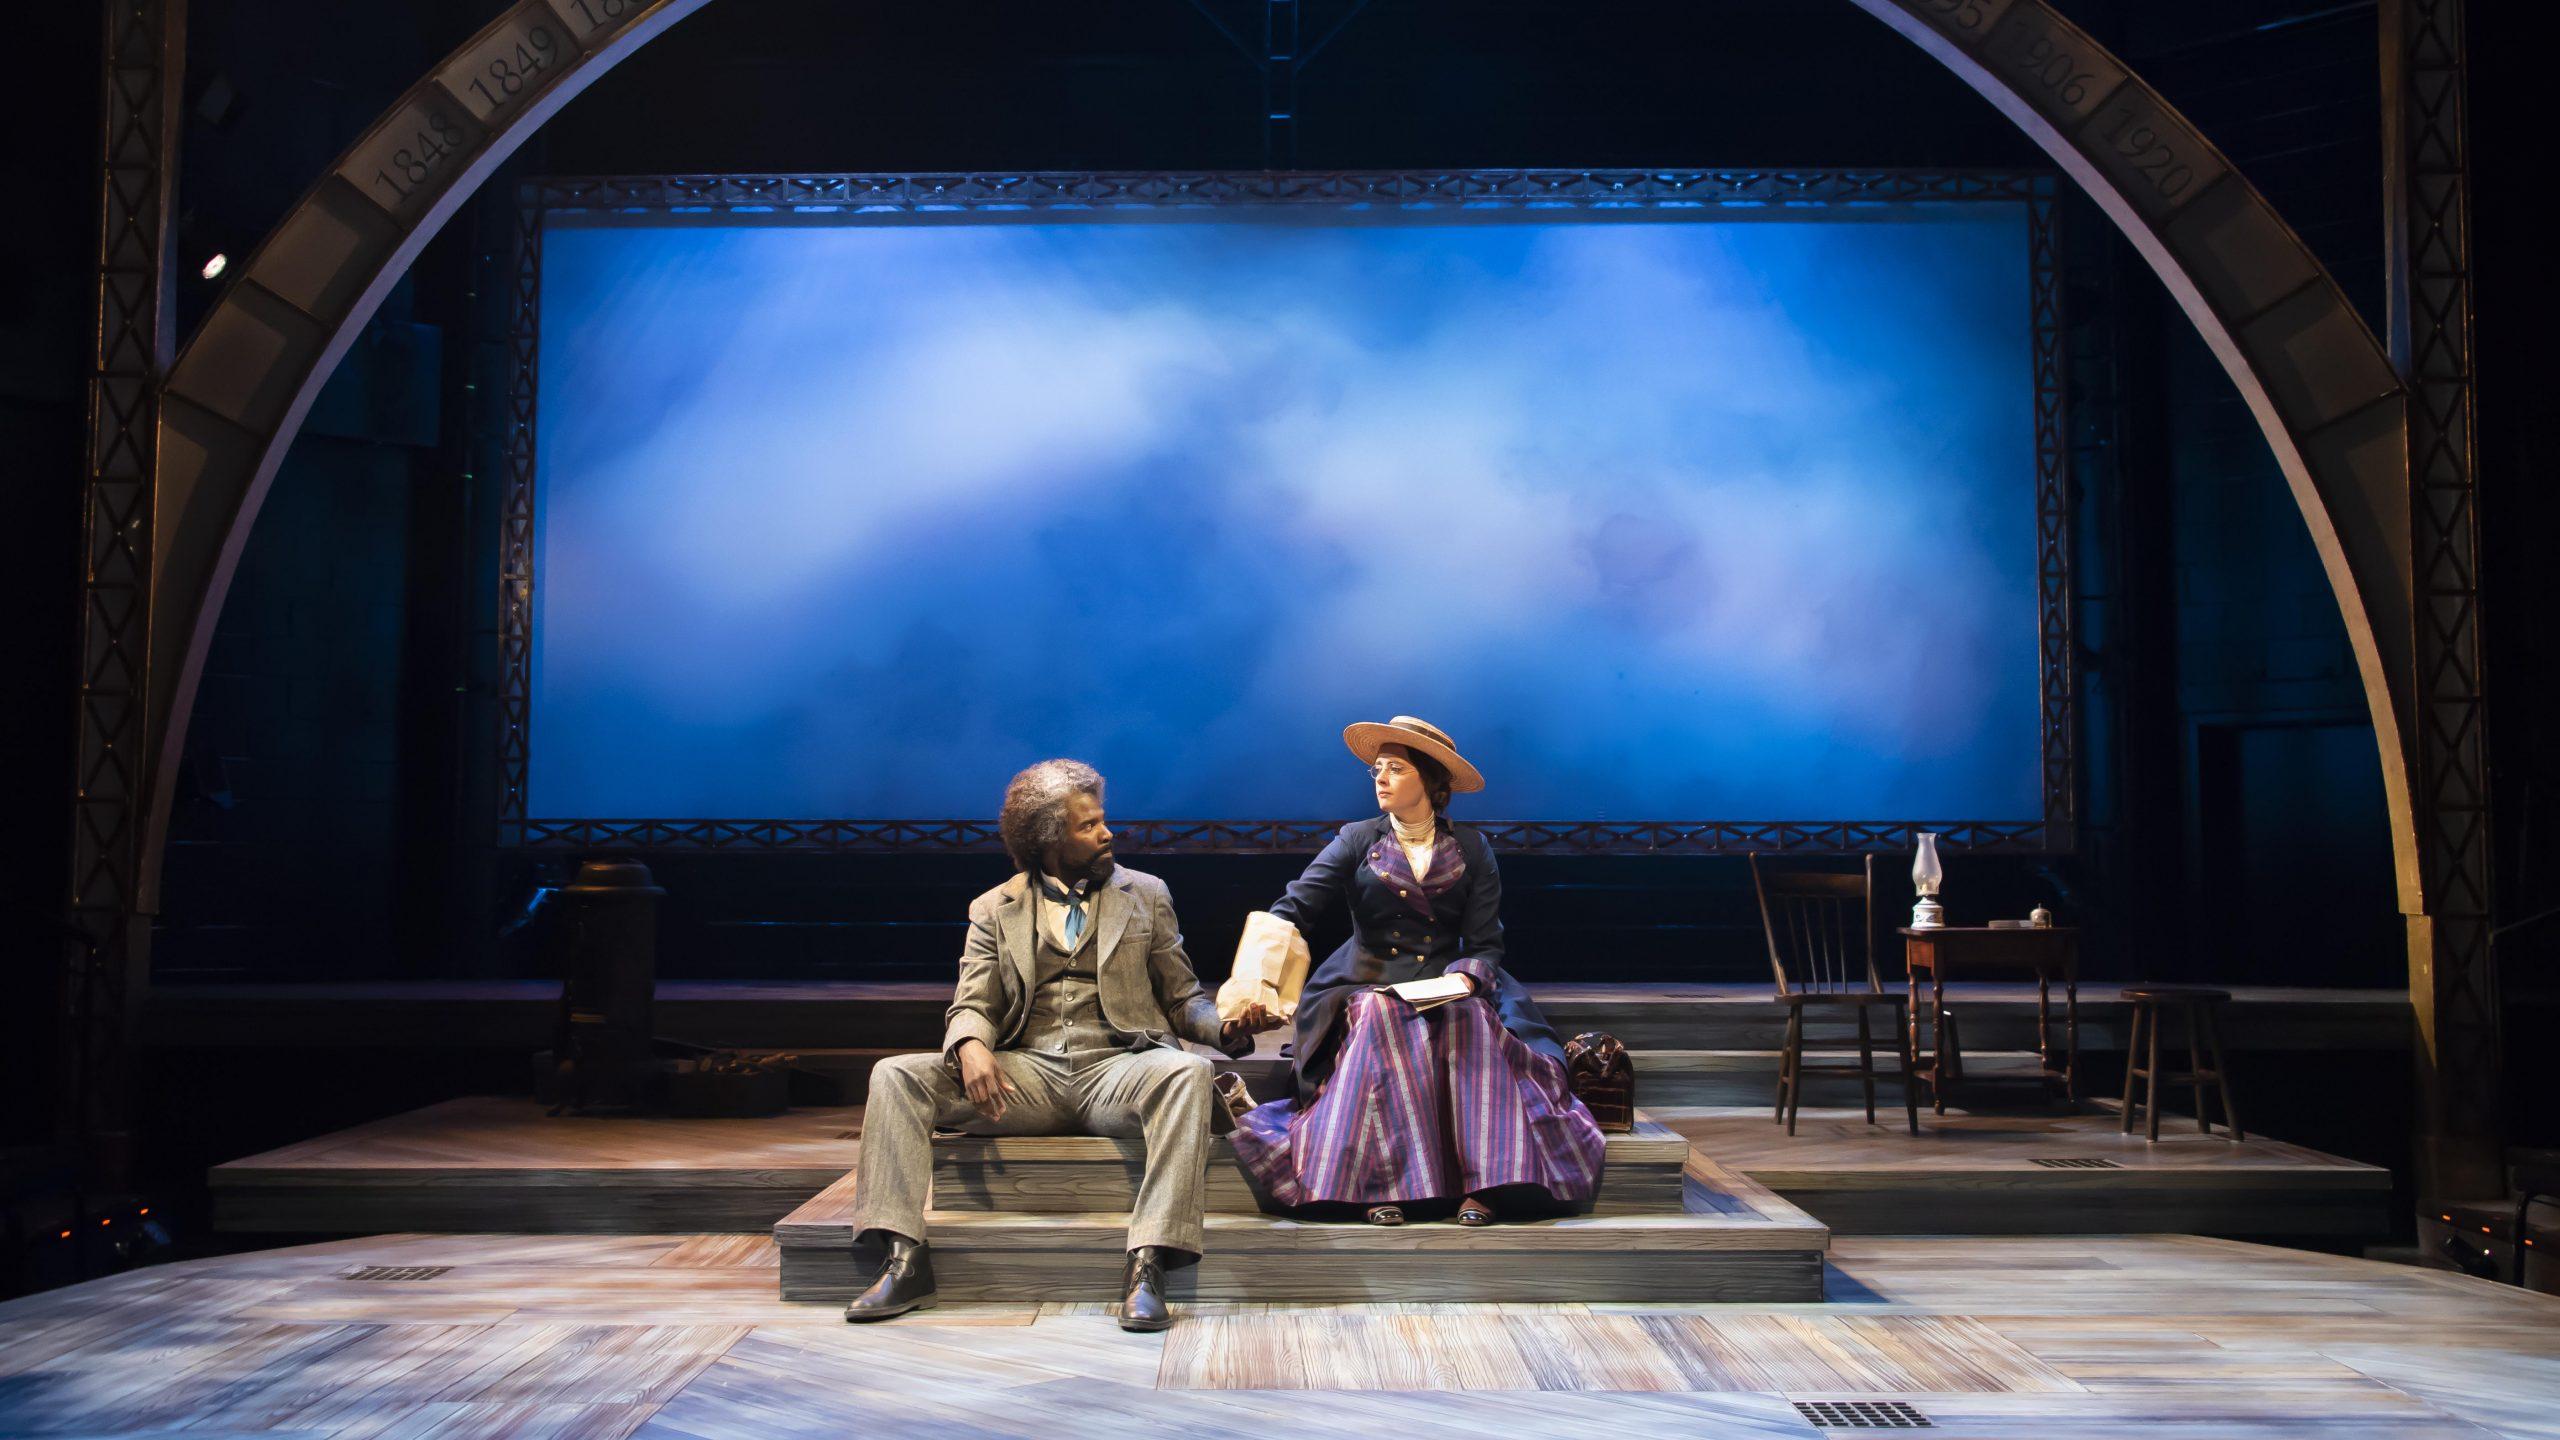 Frederick Douglass, Susan B. Anthony friendship explored in Alabama Shakespeare Festival's 'The Agitators'